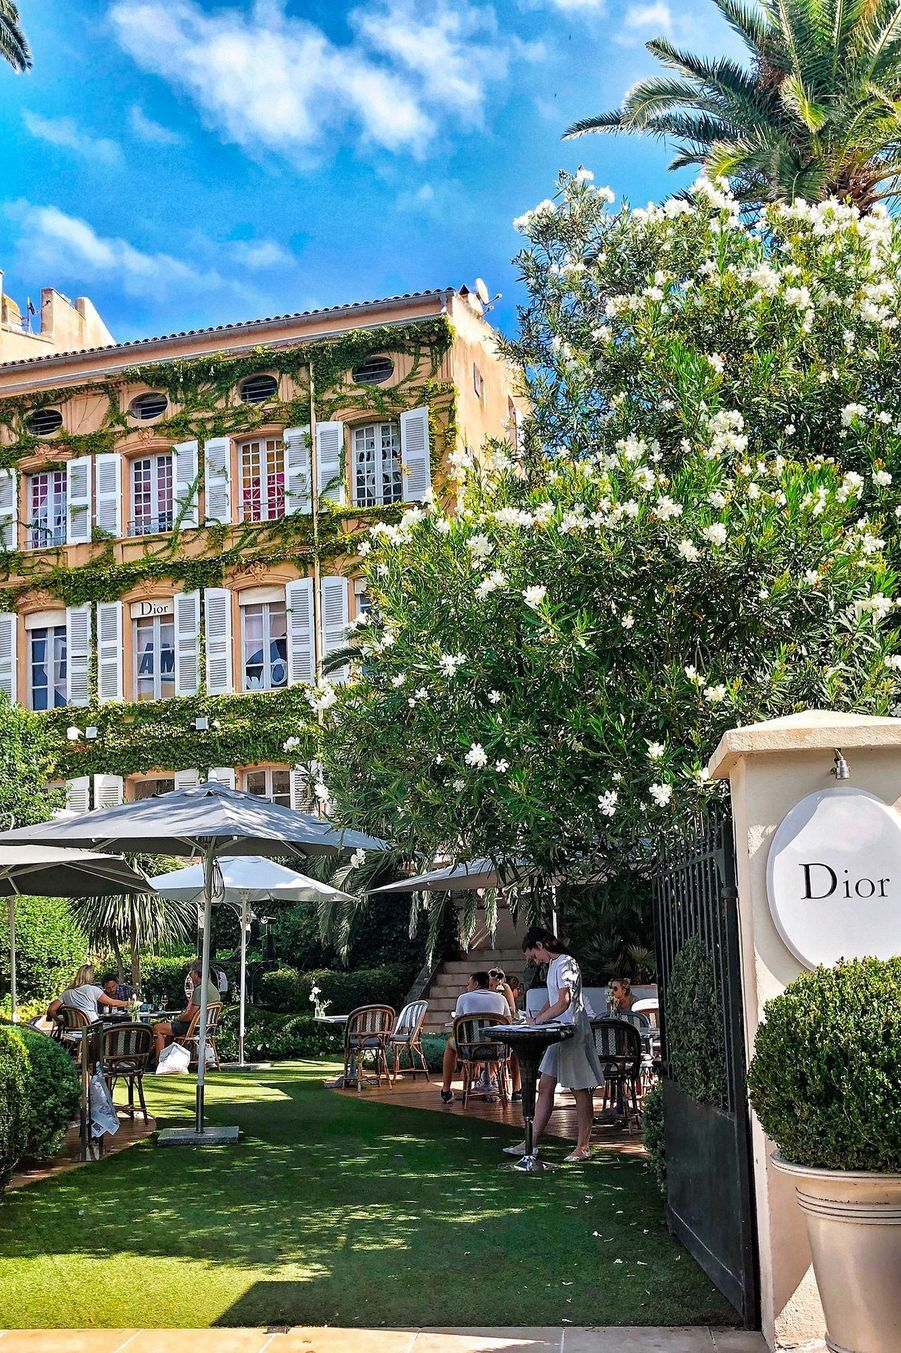 Un café chez Dior ?